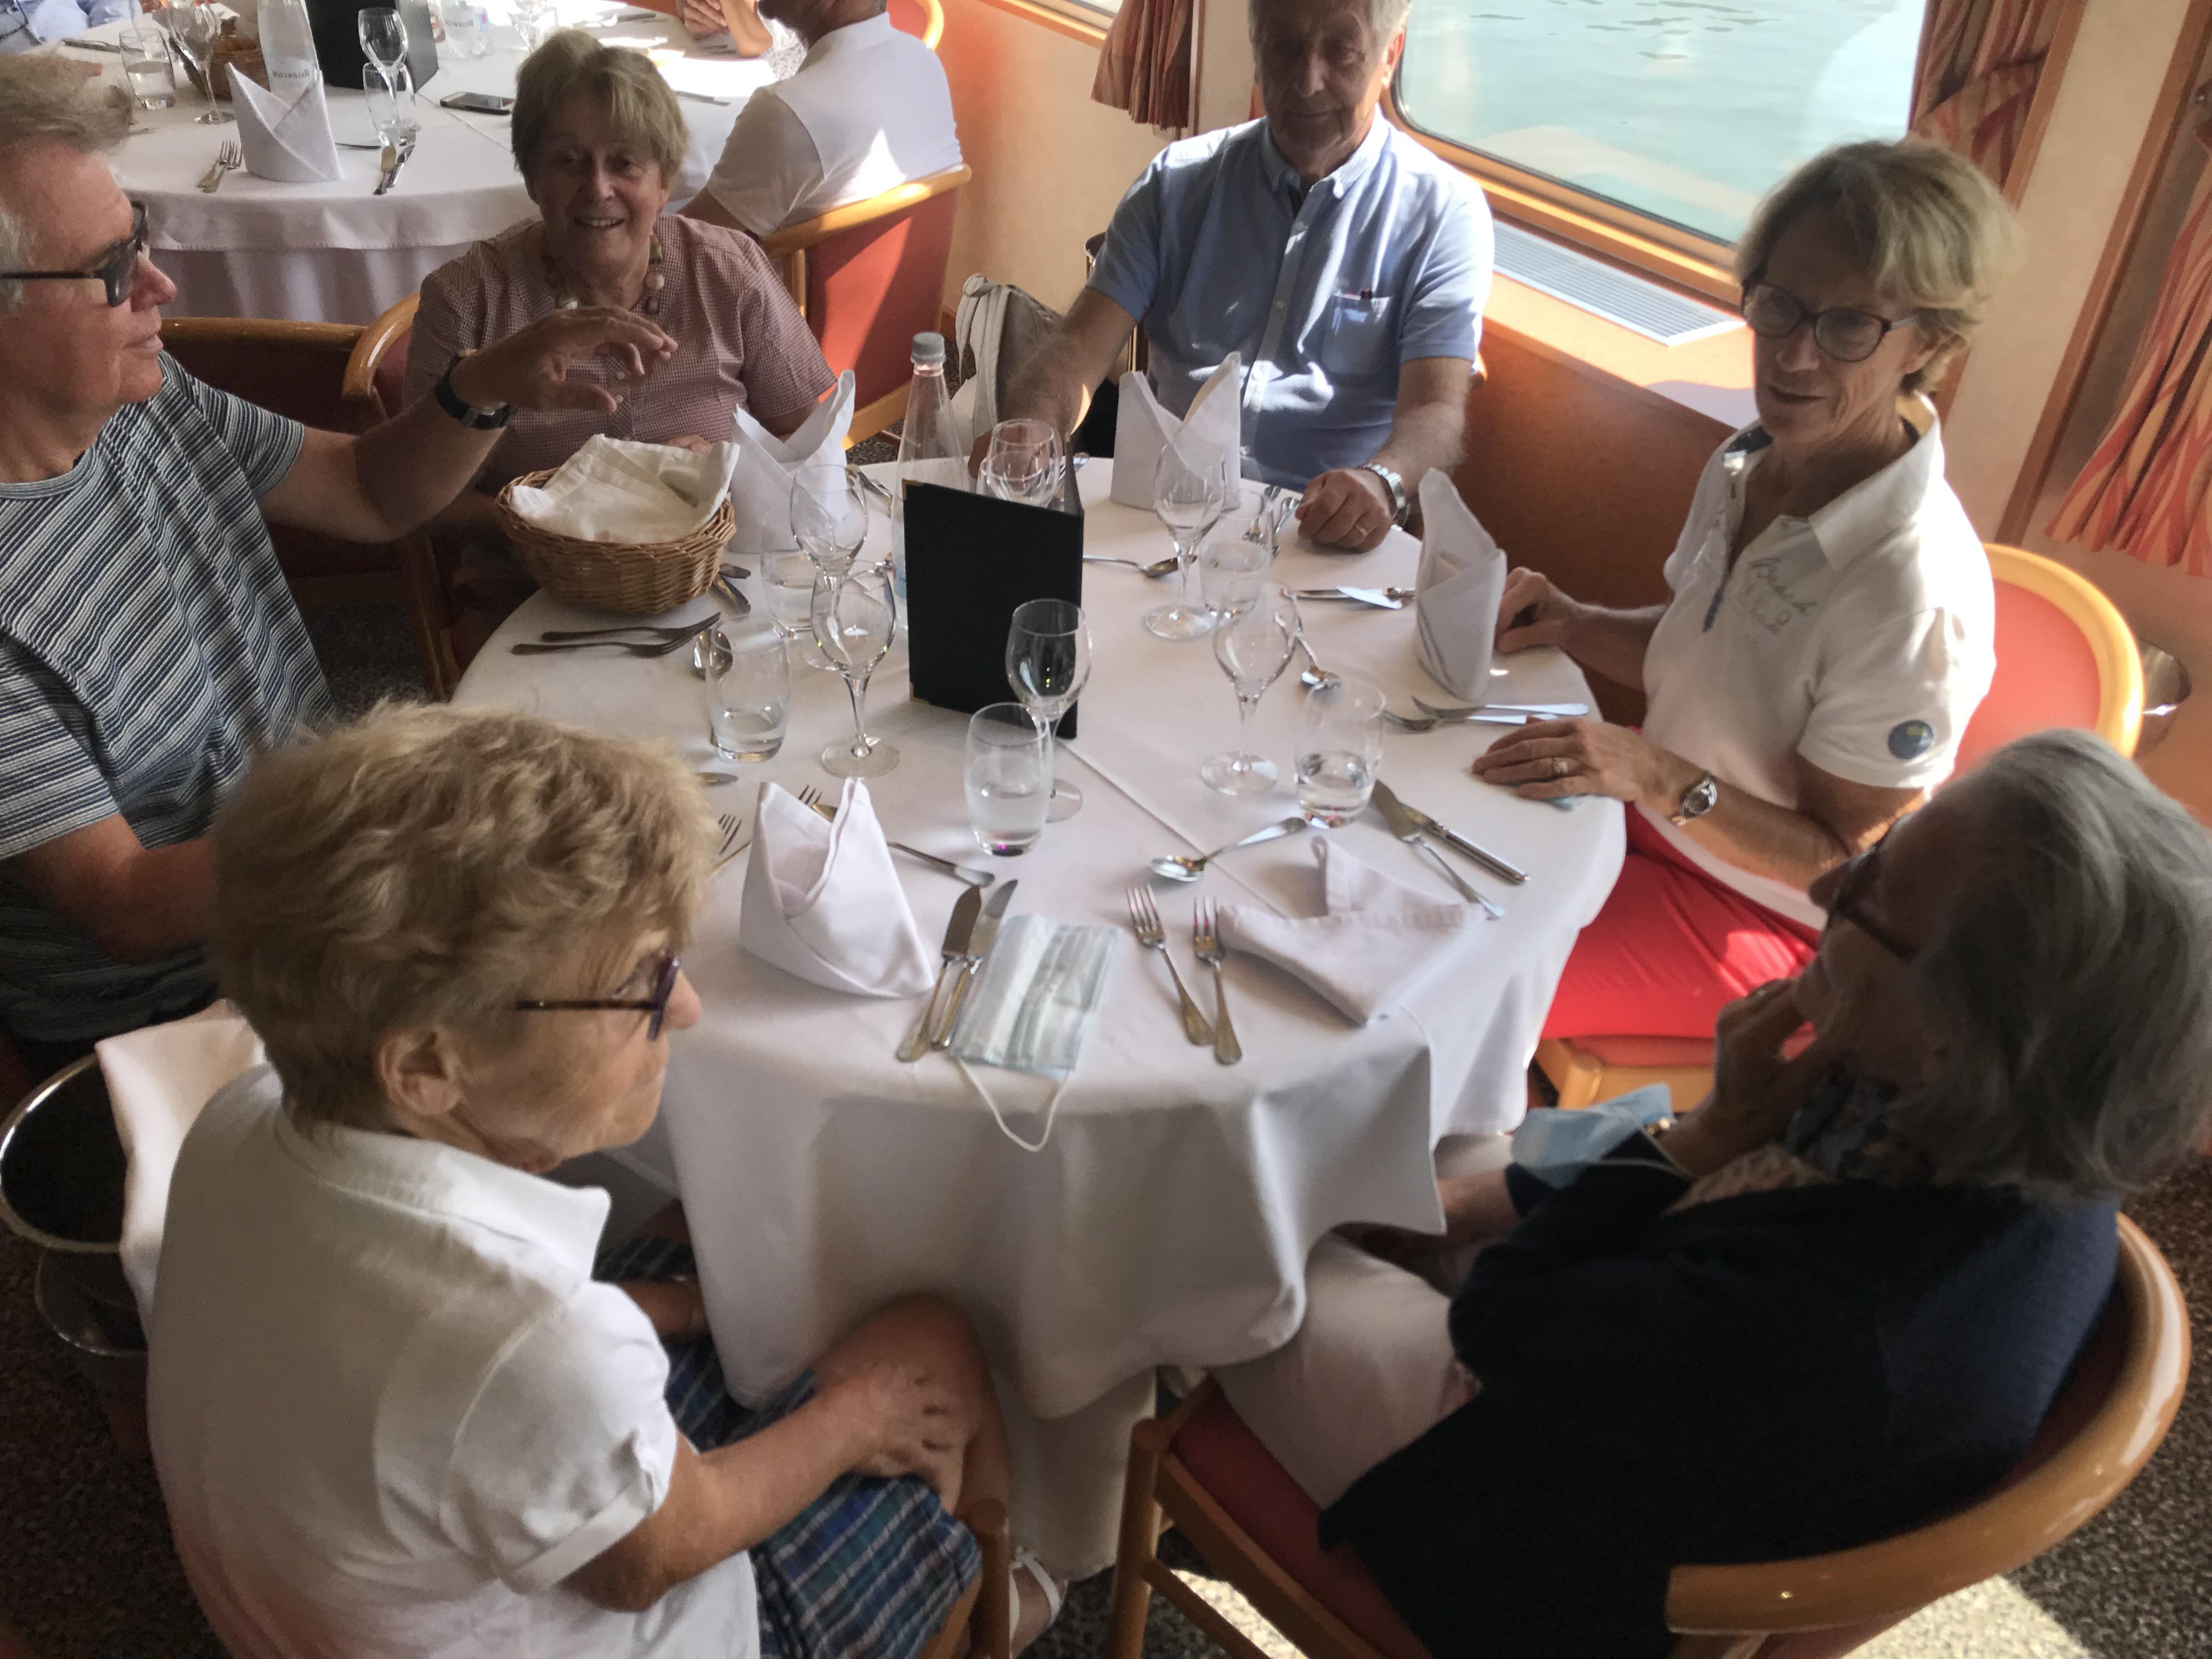 La table, un bon moment à bord - DR : JLR